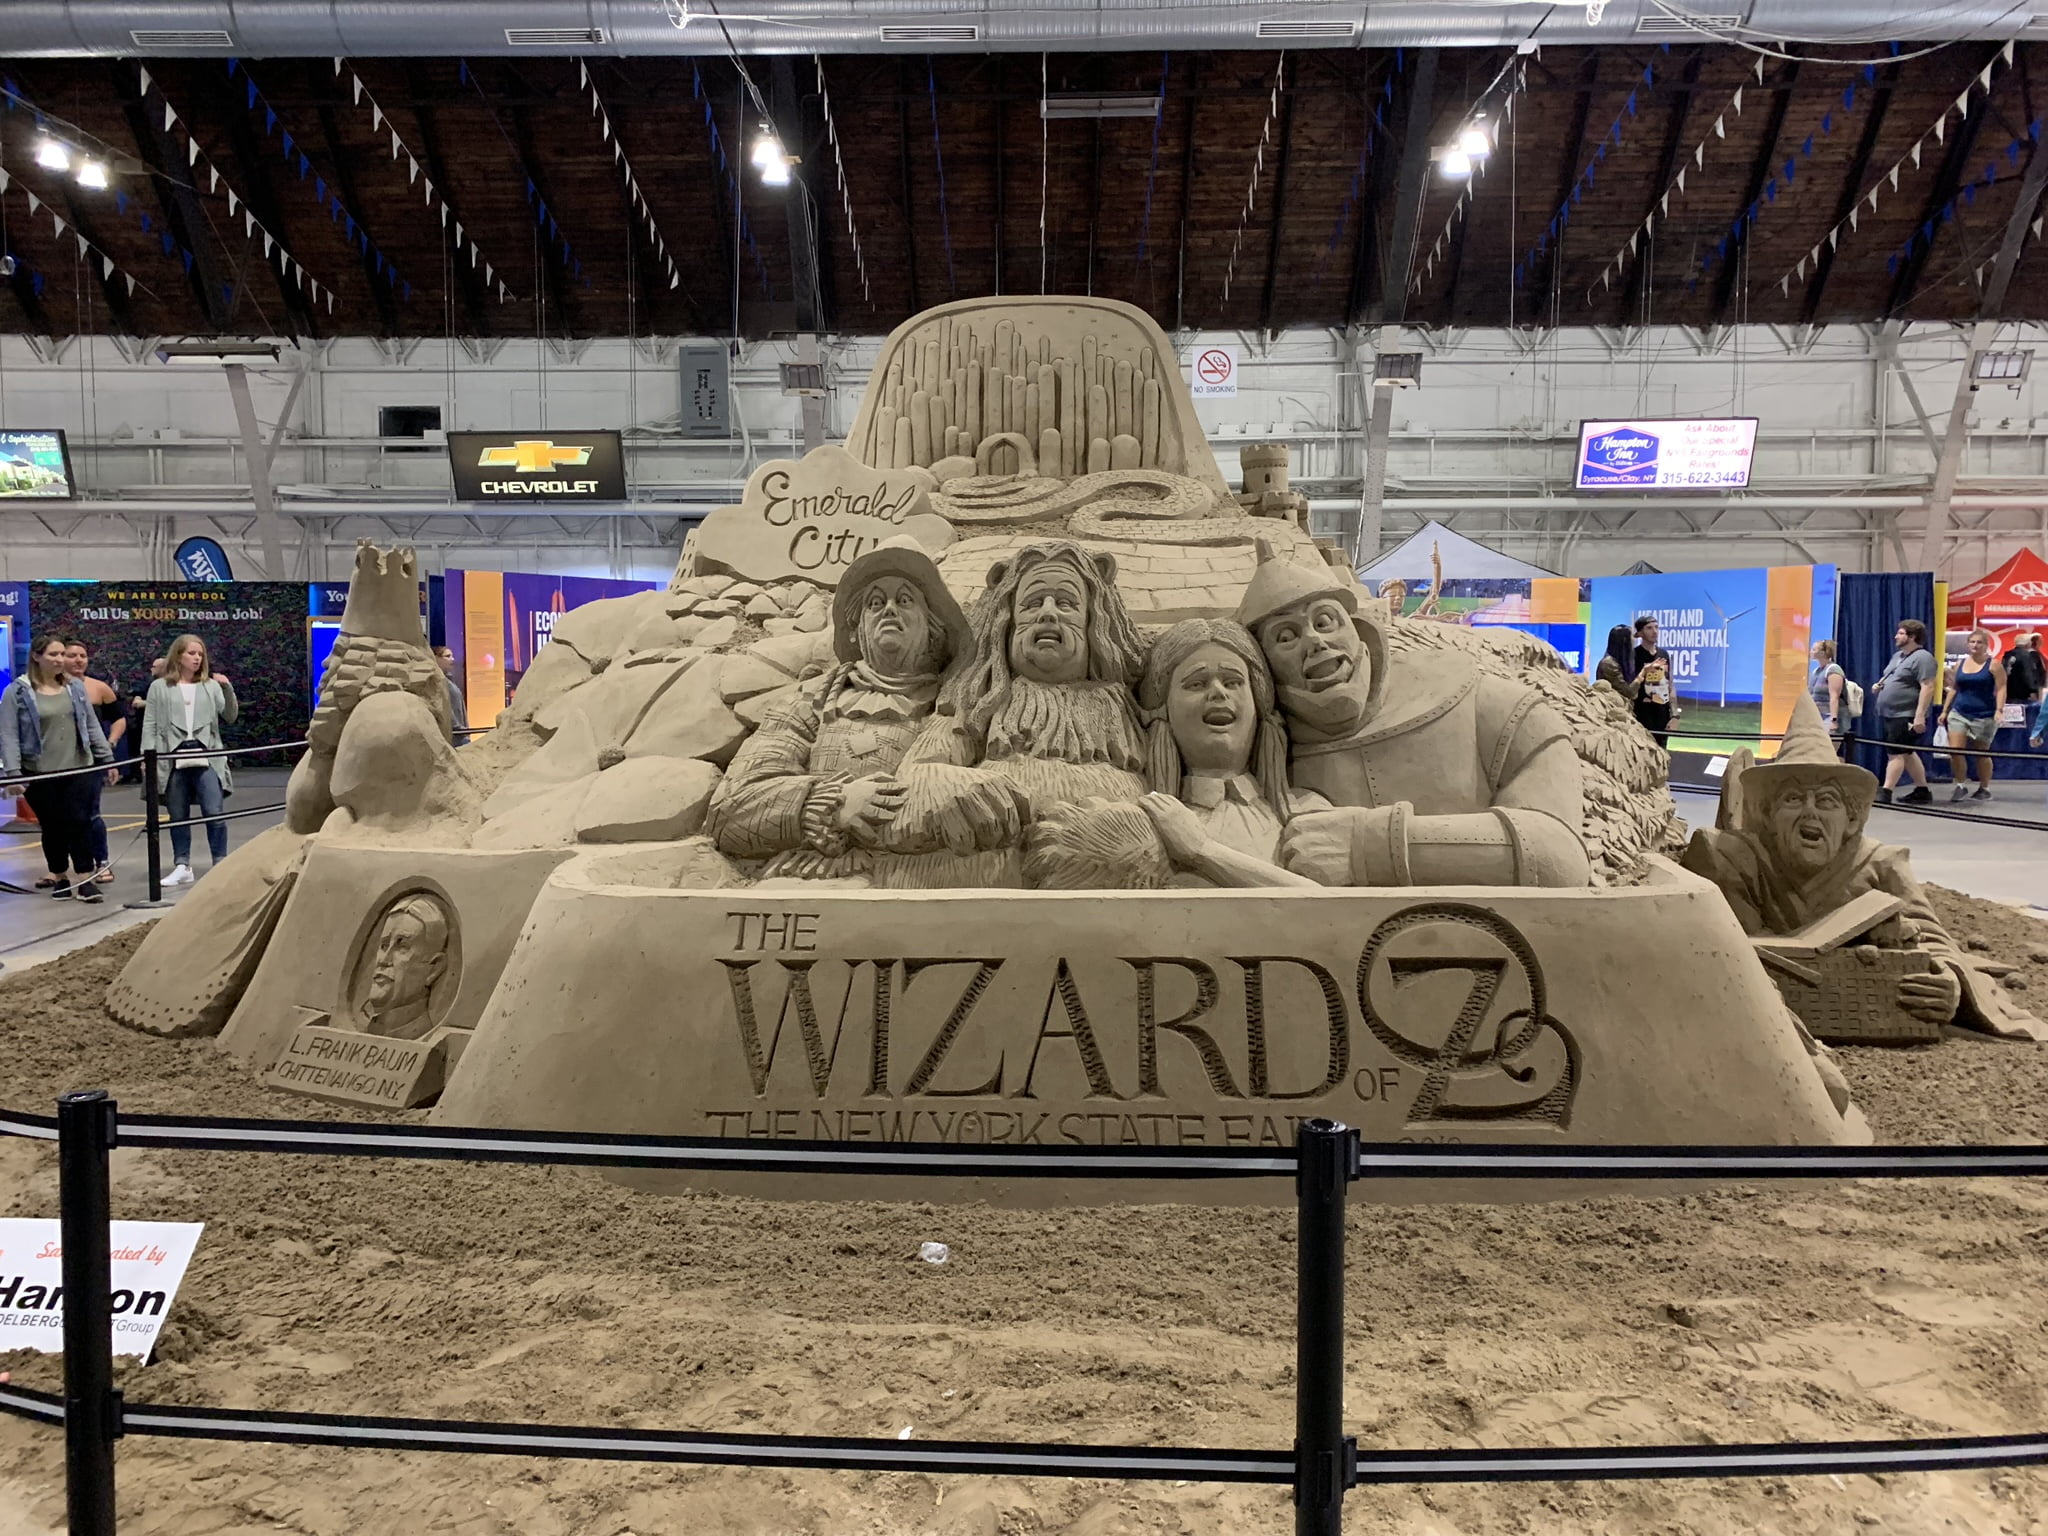 Wizard of Oz sand sculpture